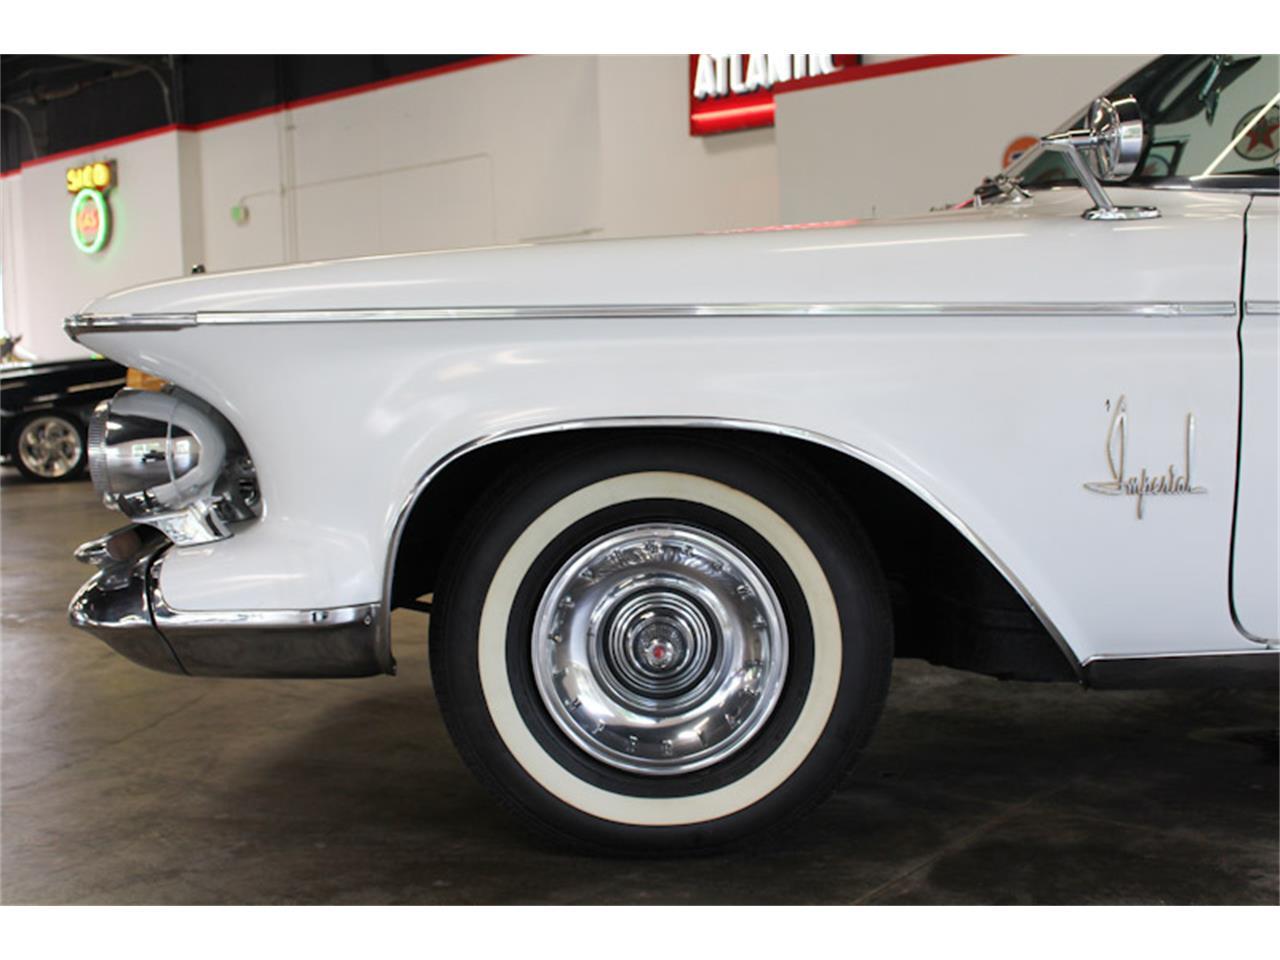 1962 Chrysler Imperial (CC-1206242) for sale in Fairfield, California